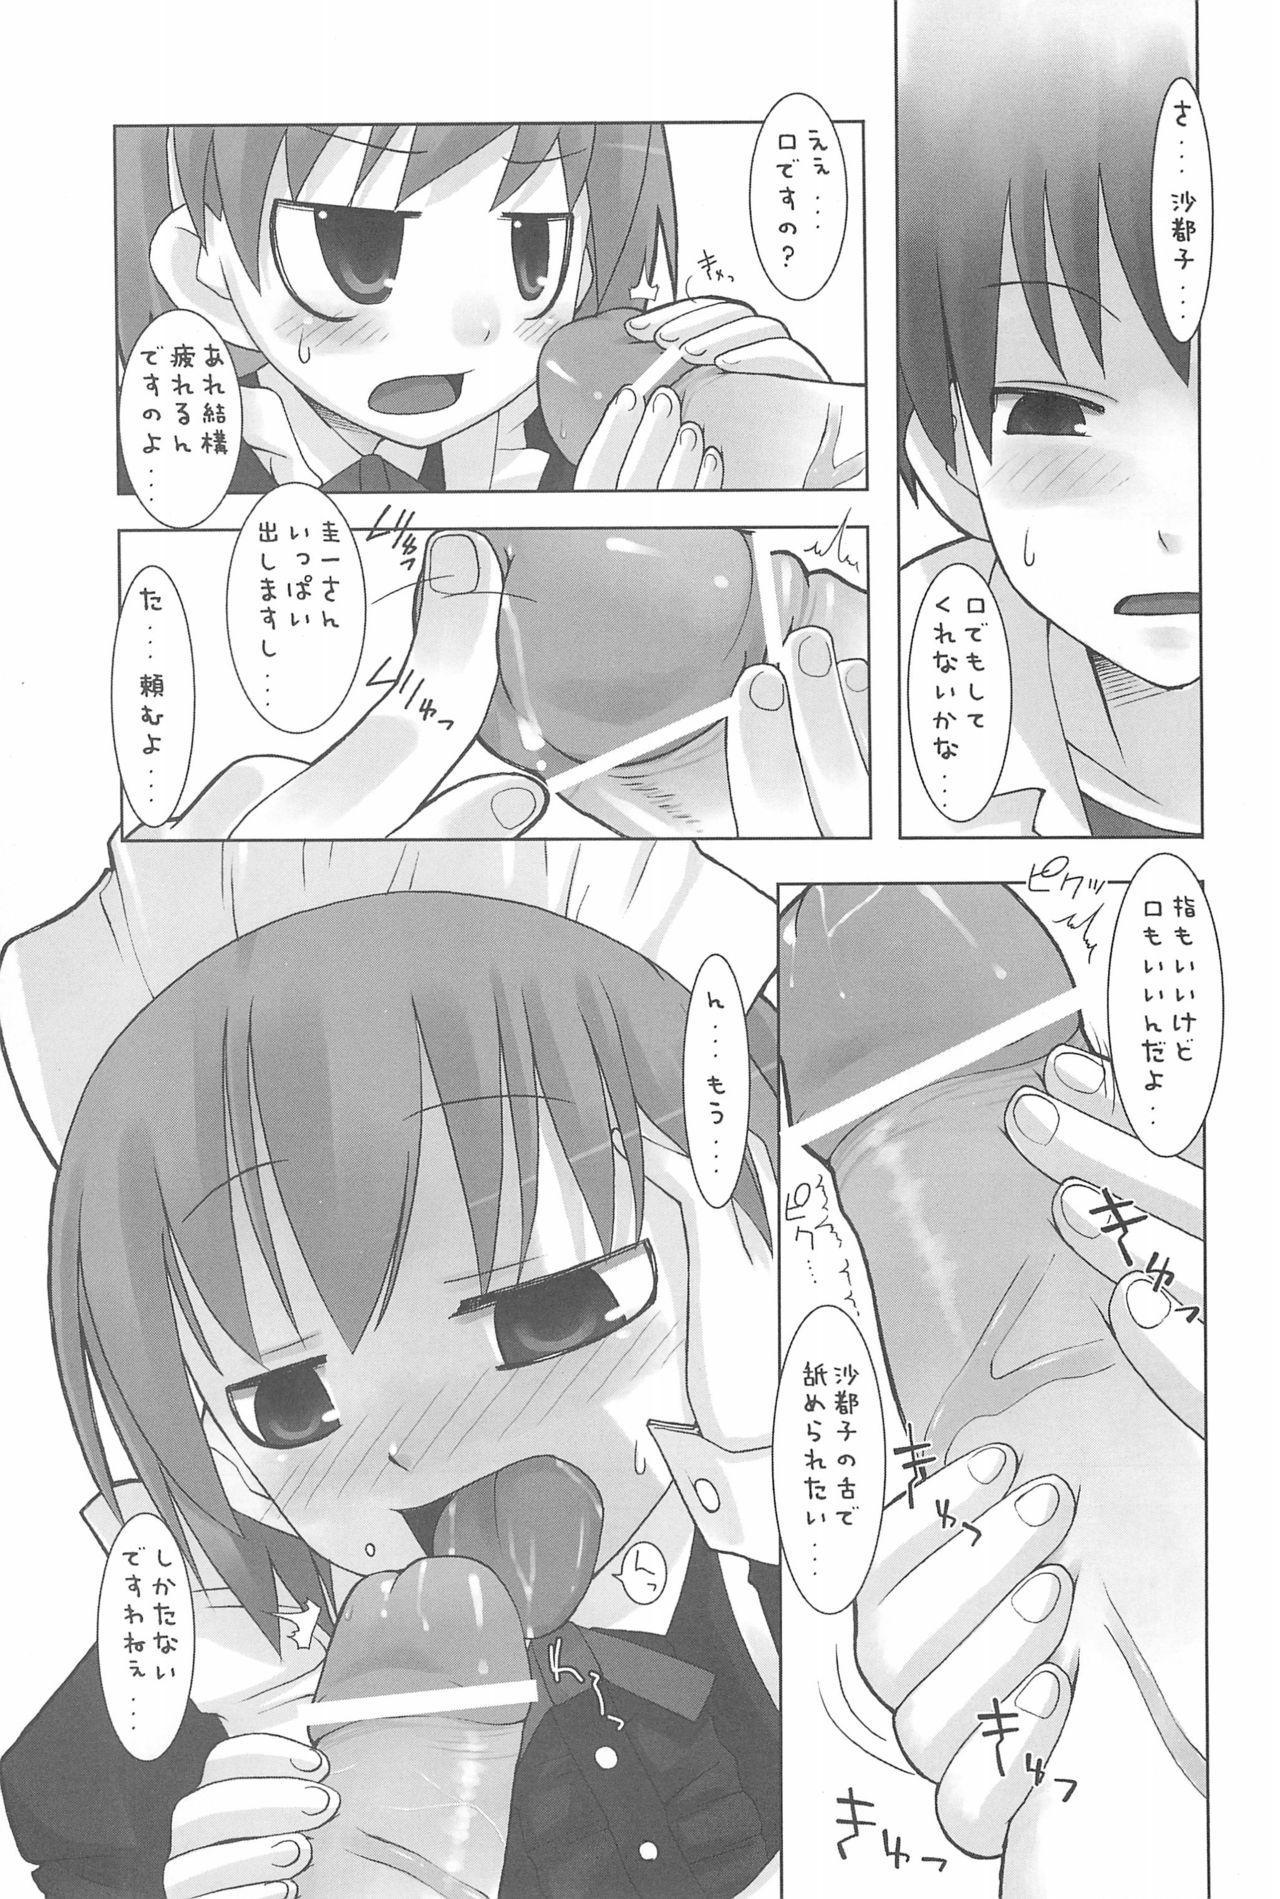 Saga Continue 8